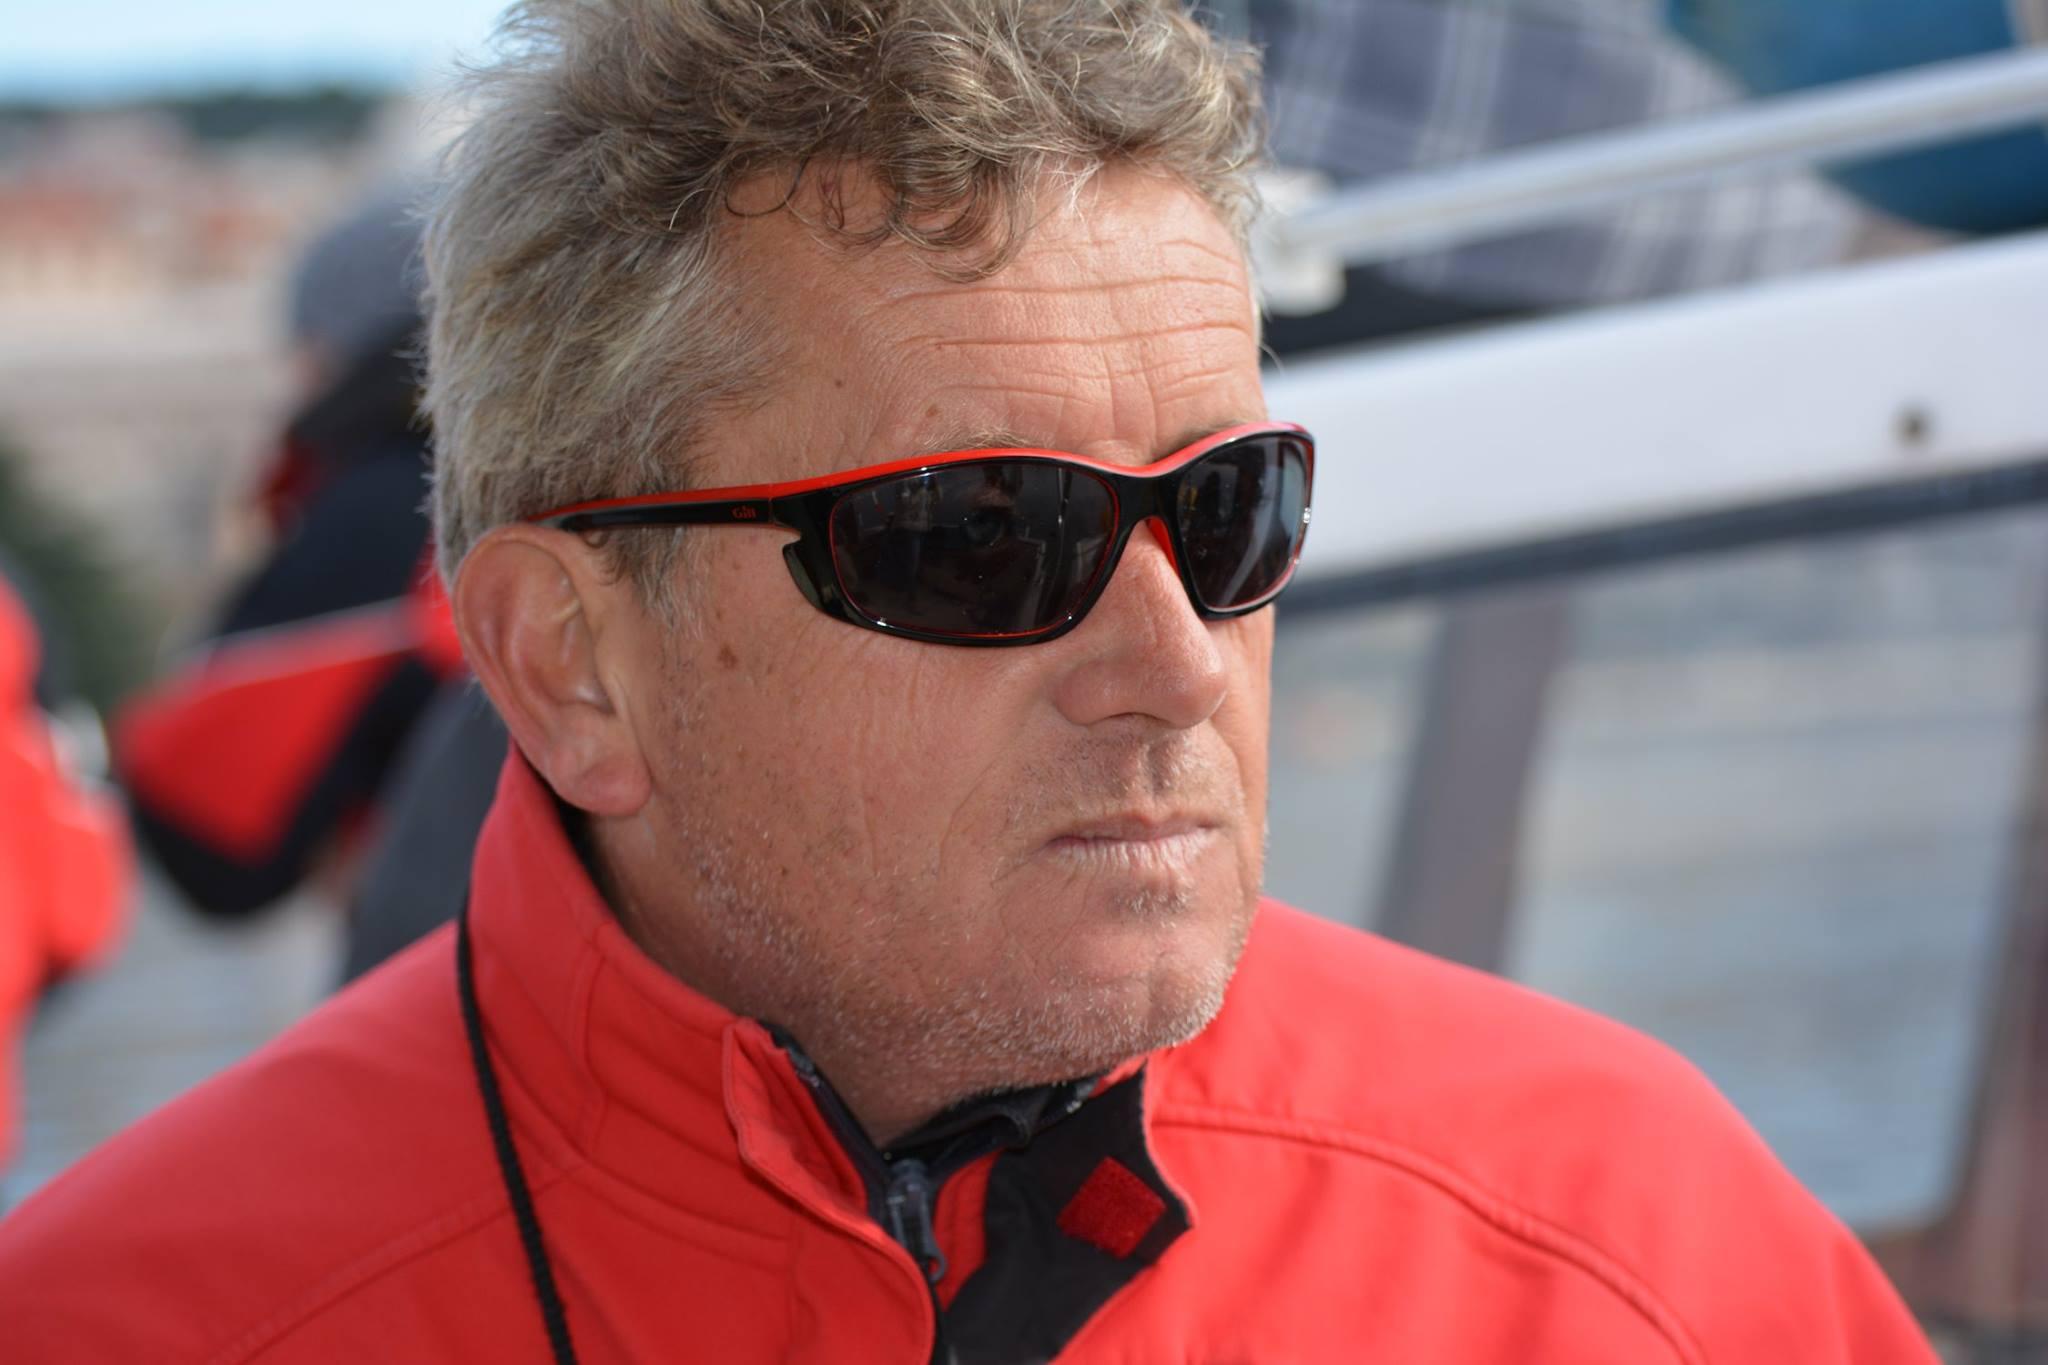 Denis Marinov